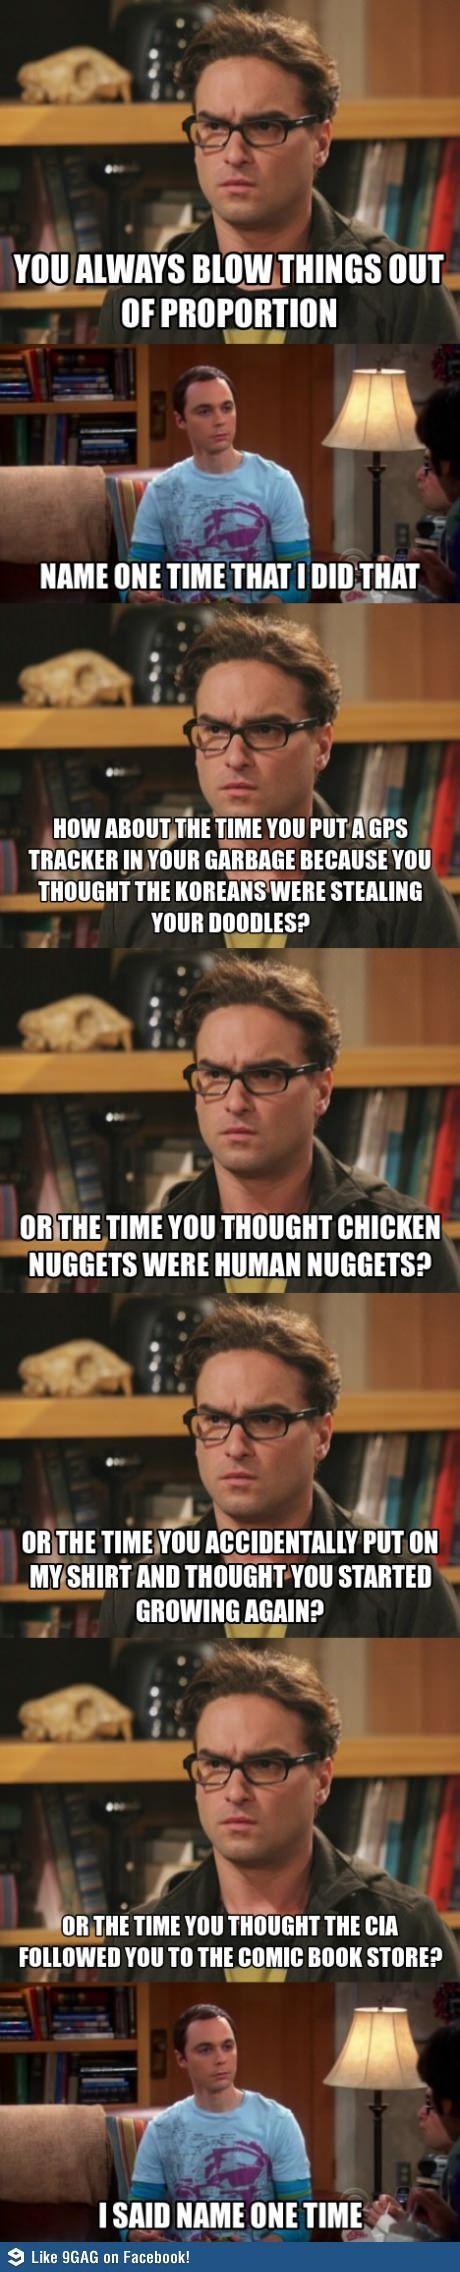 Just Sheldon Overreacting...